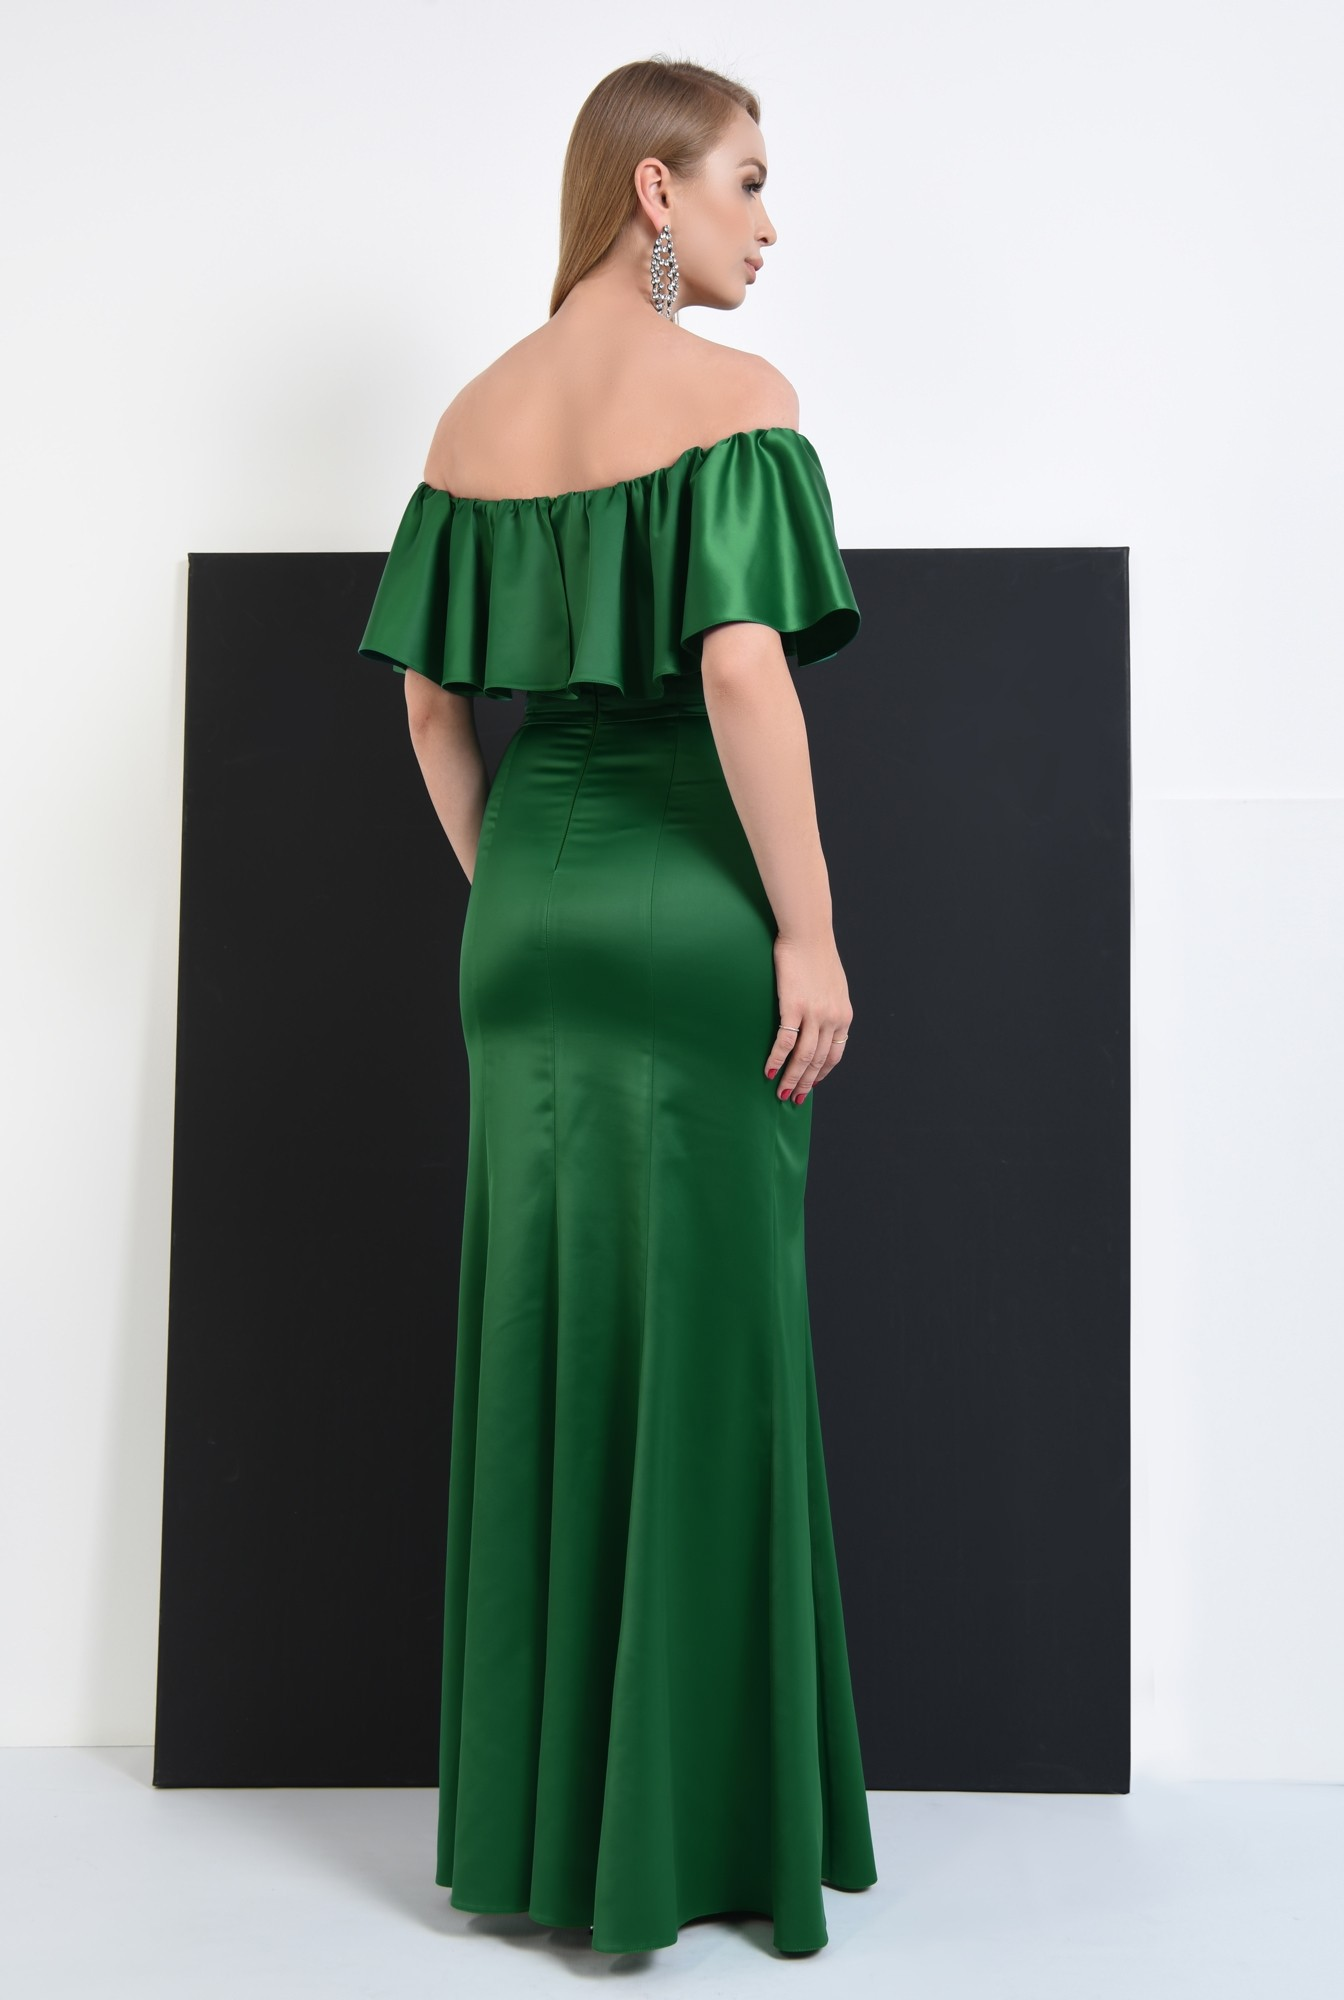 0 - rochie de seara smarald, slit adanc, umeri dezgoliti, maxi